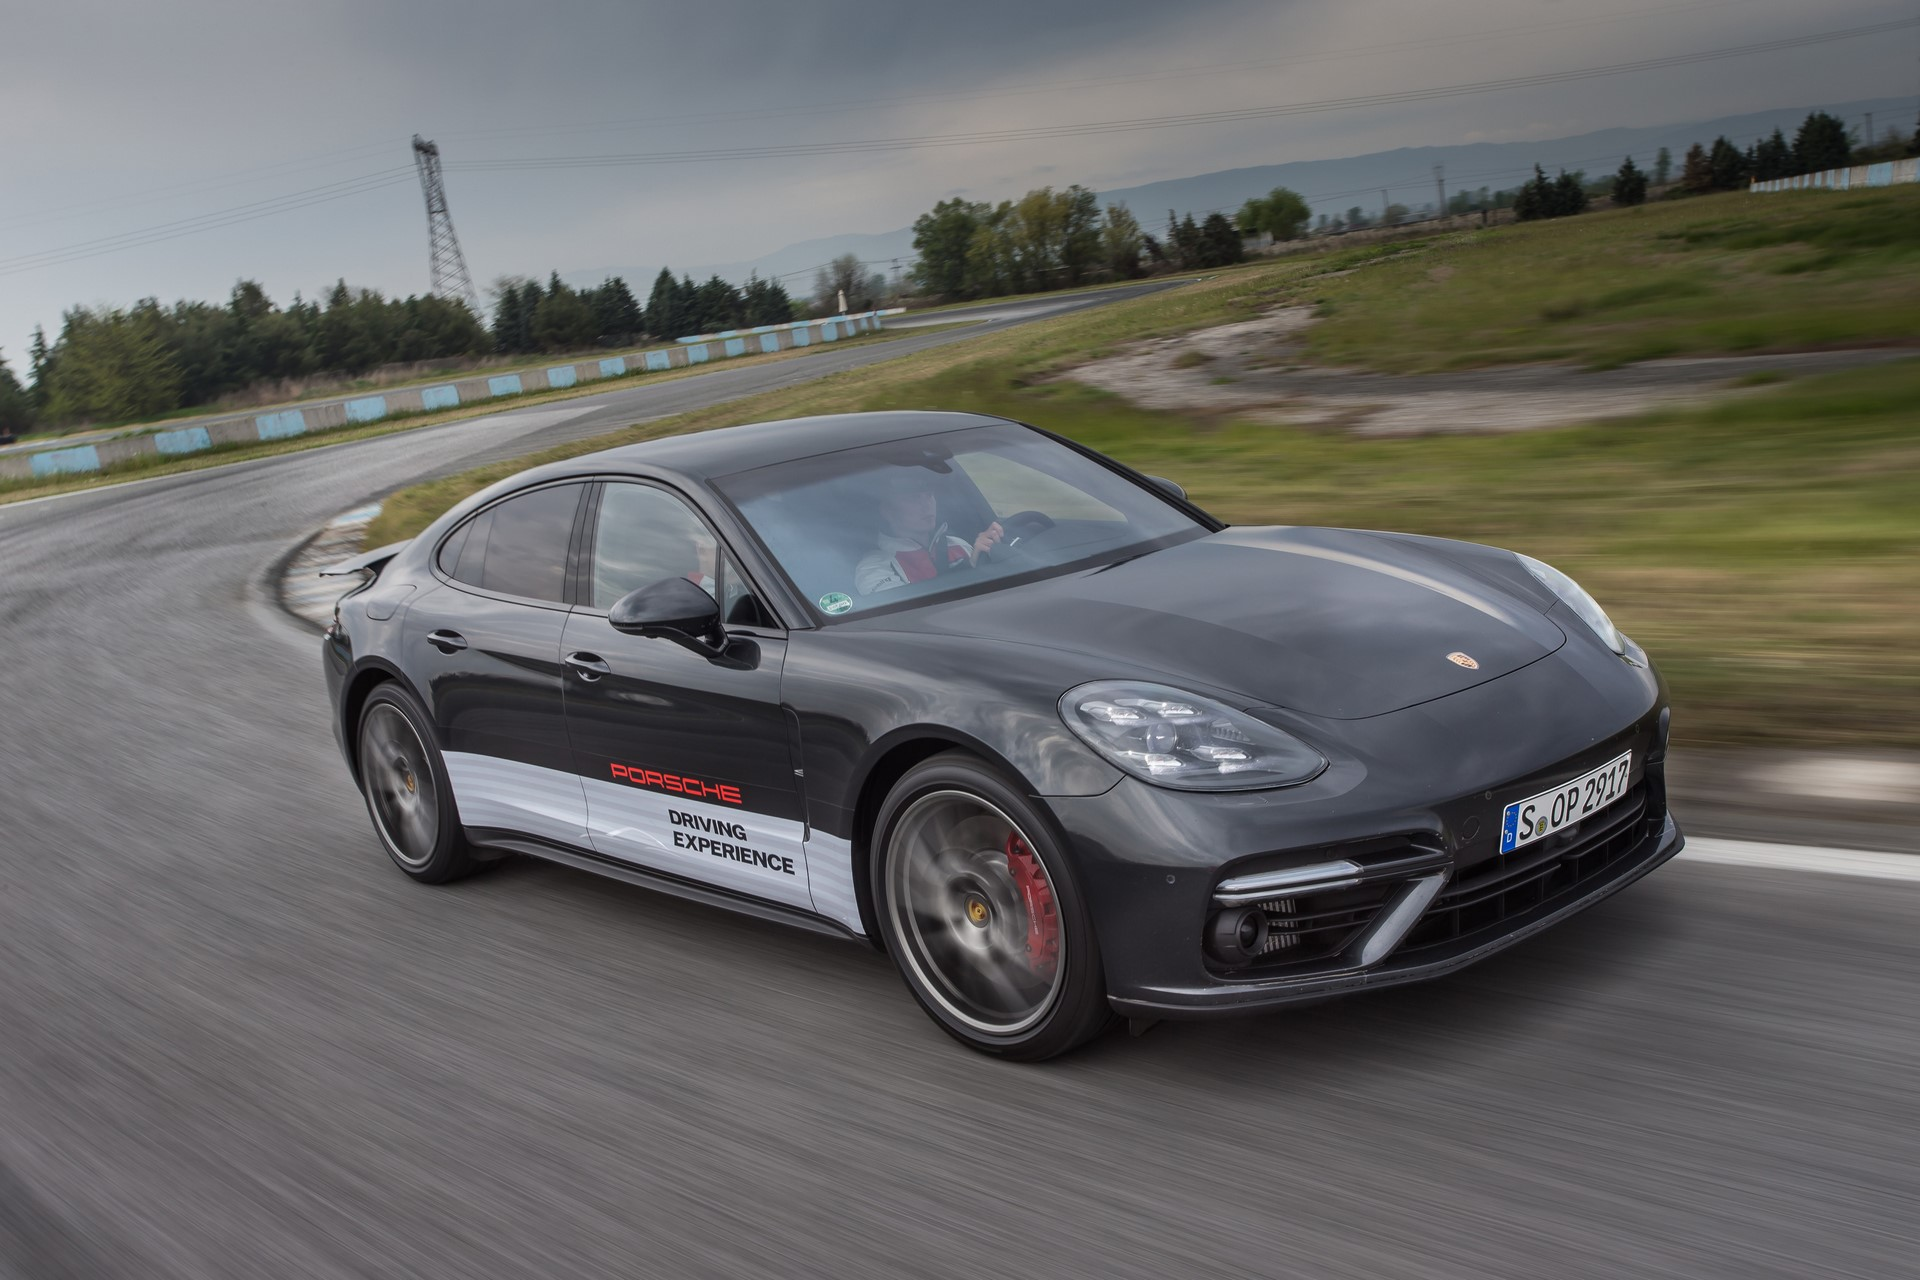 Porsche Driving Experience 2017 Serres (43)